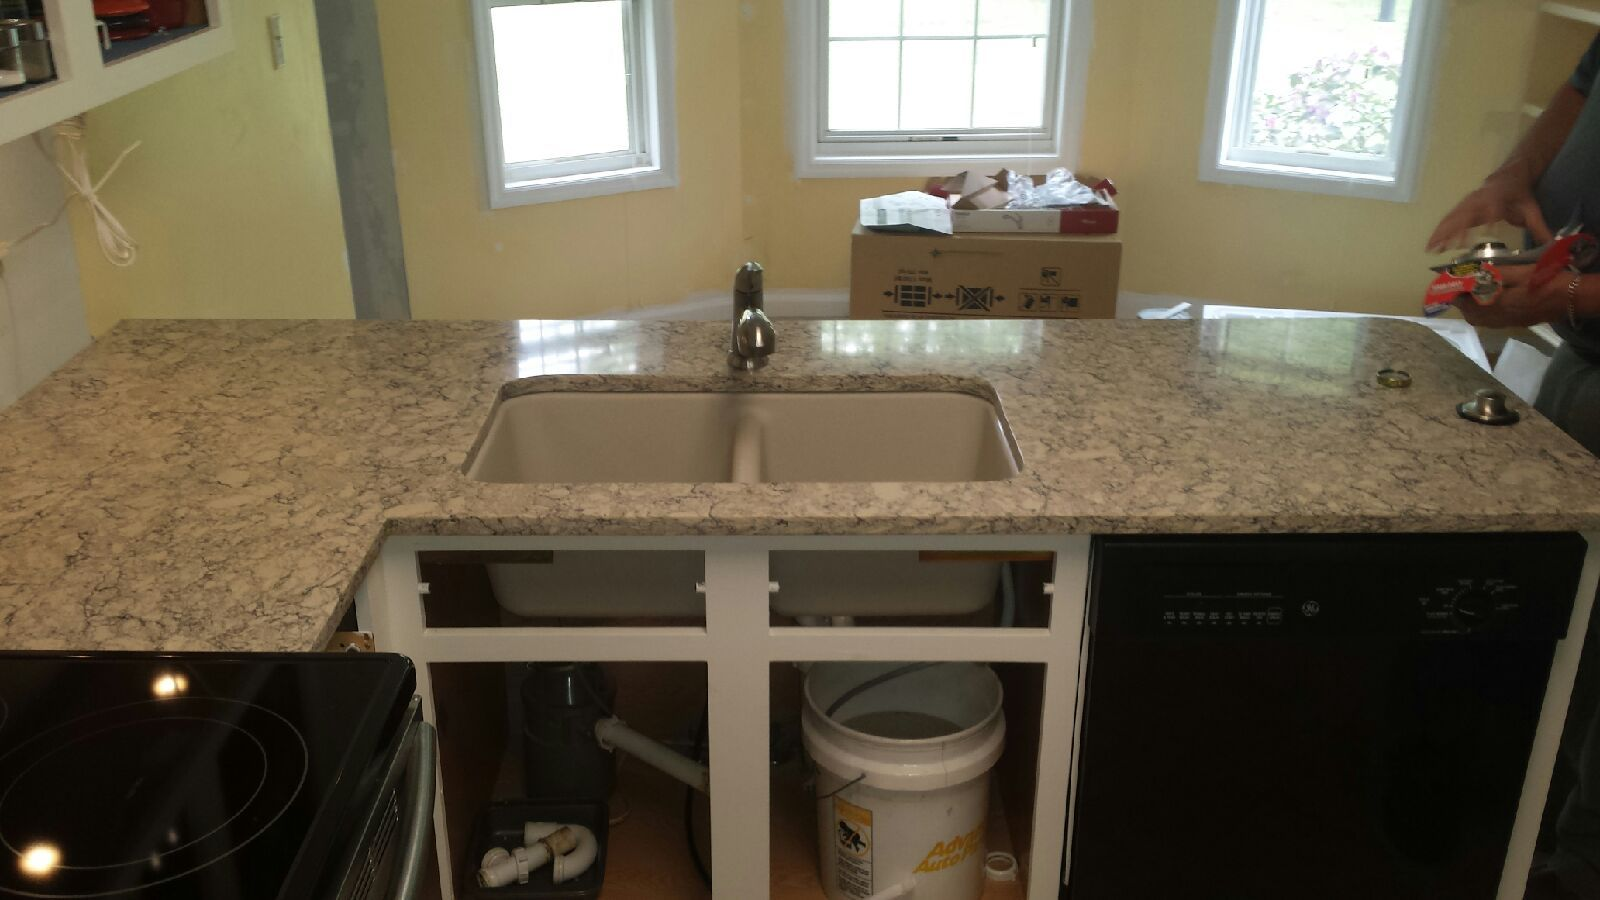 Intermezzo LG Quartz Kitchen Countertop Install For The Dunn Family.  Knoxvilleu0027s Stone Interiors. Showroom